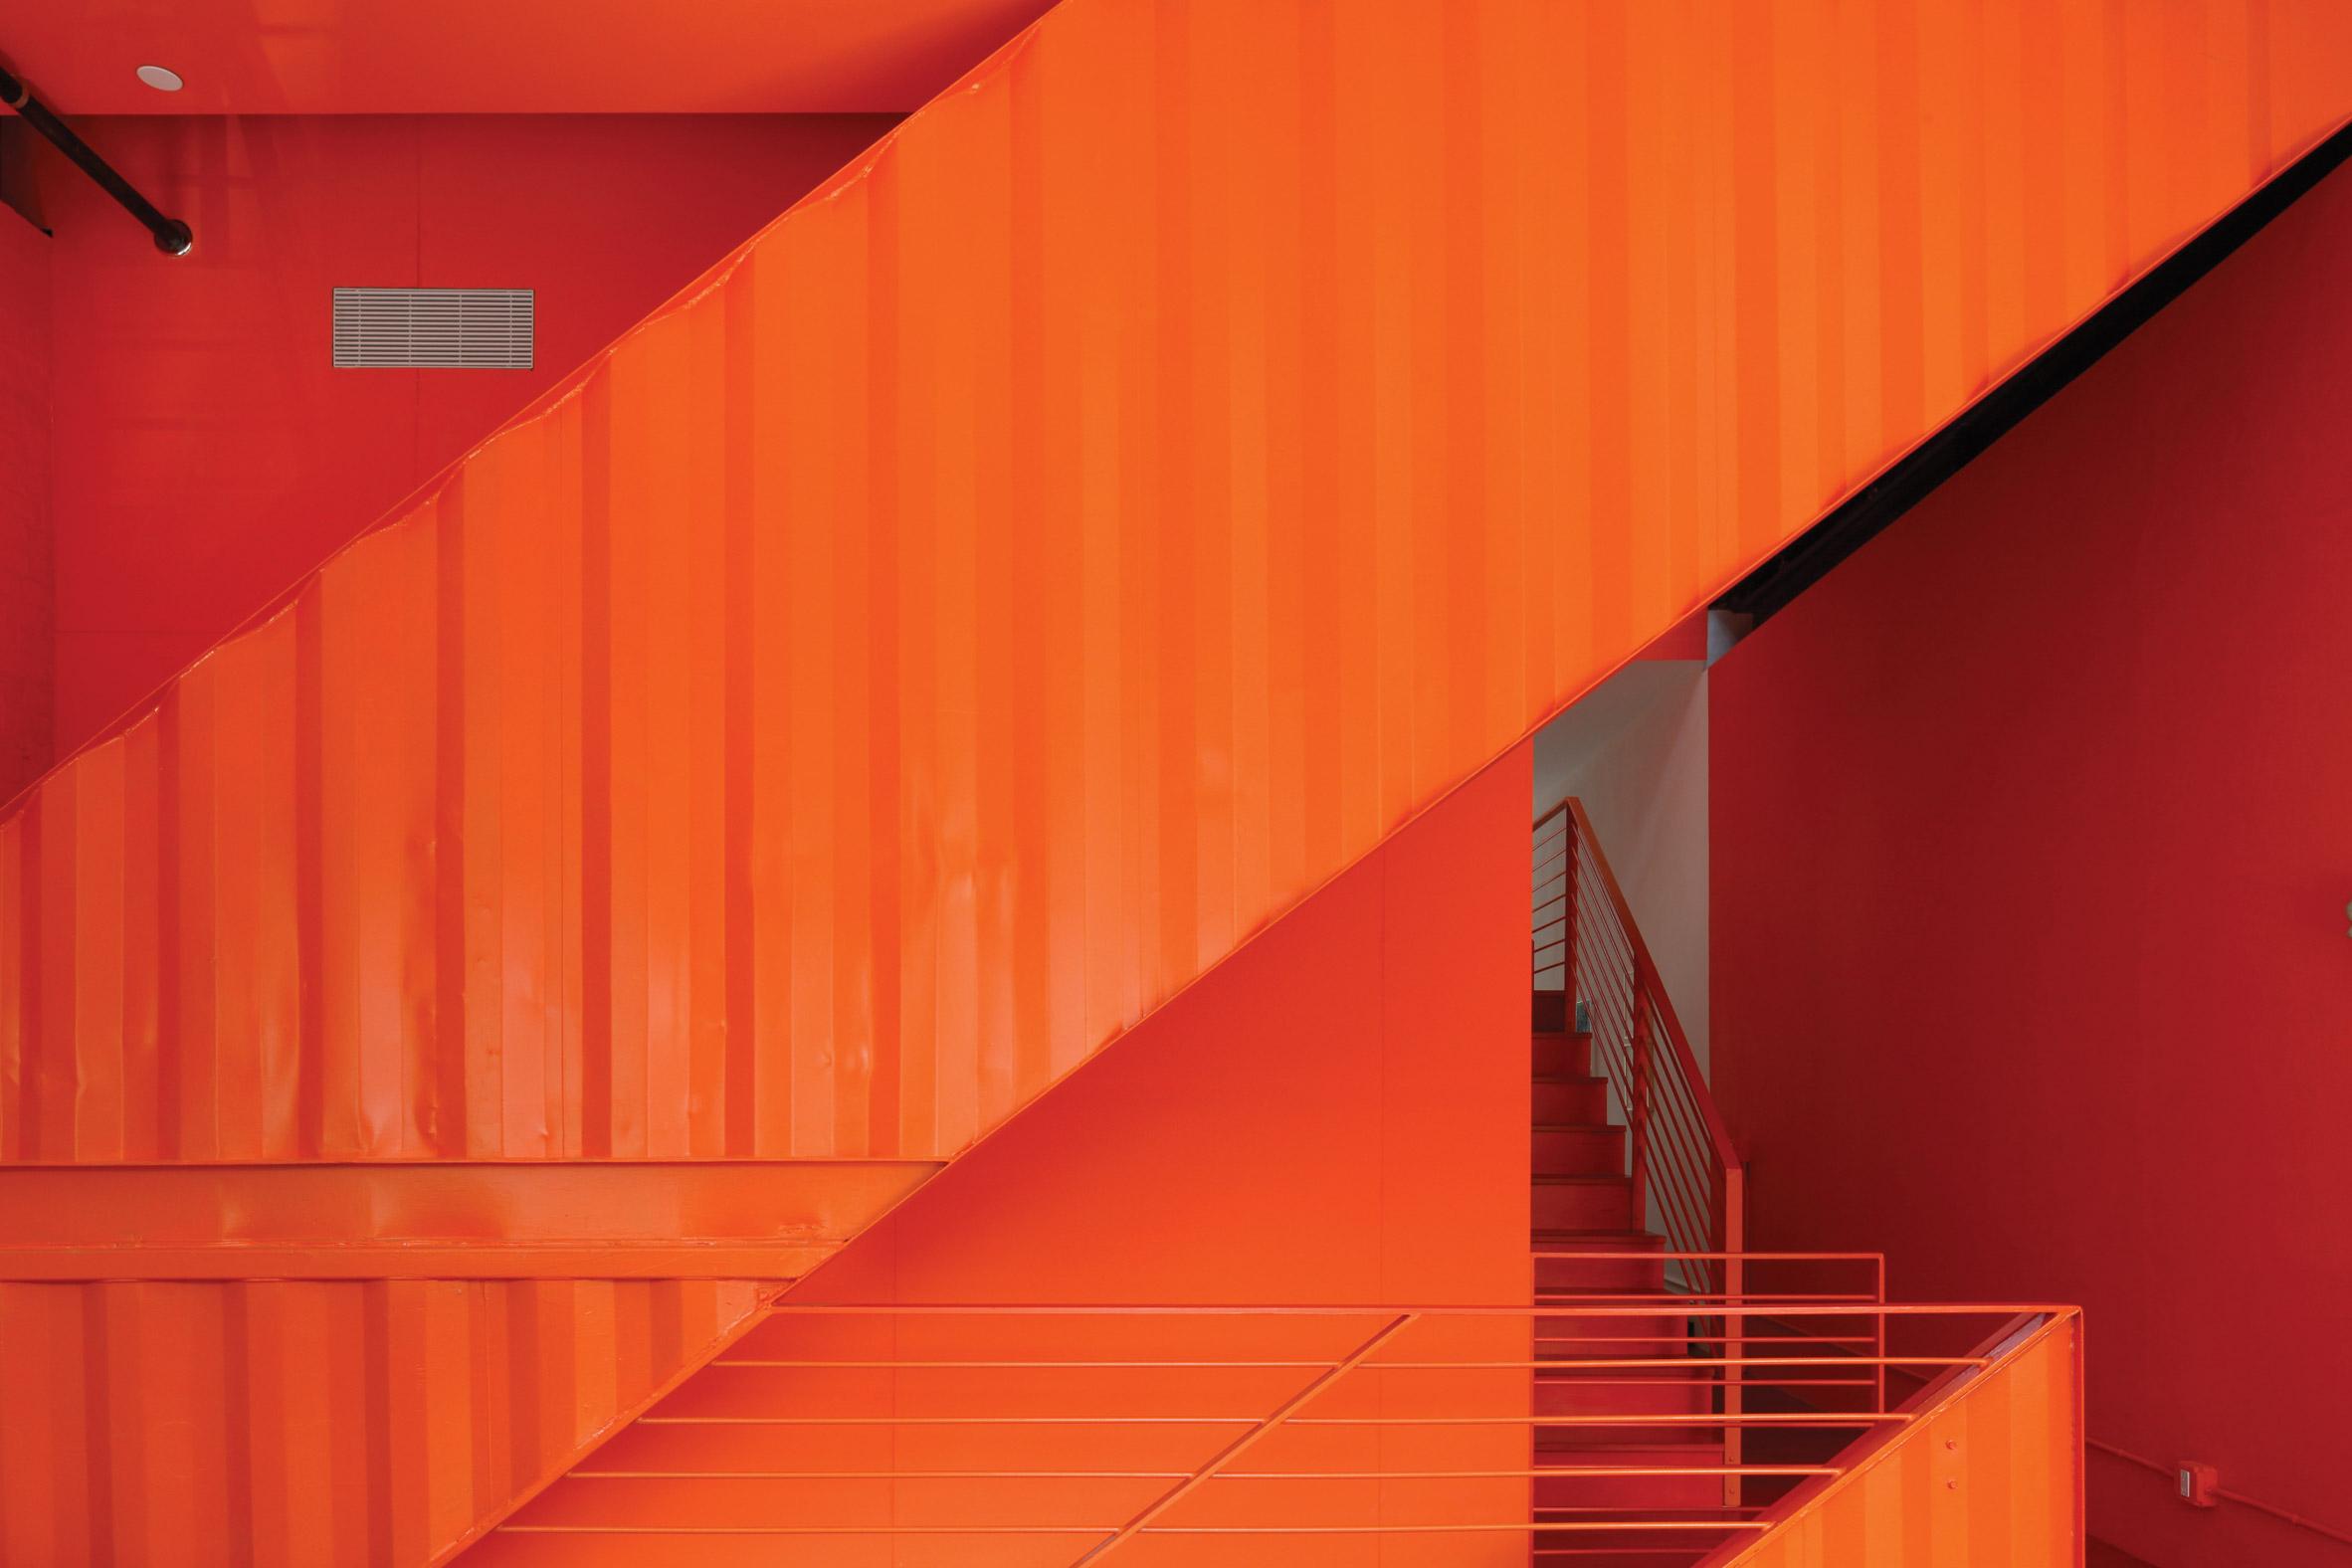 Irving Place project by LOT-EK